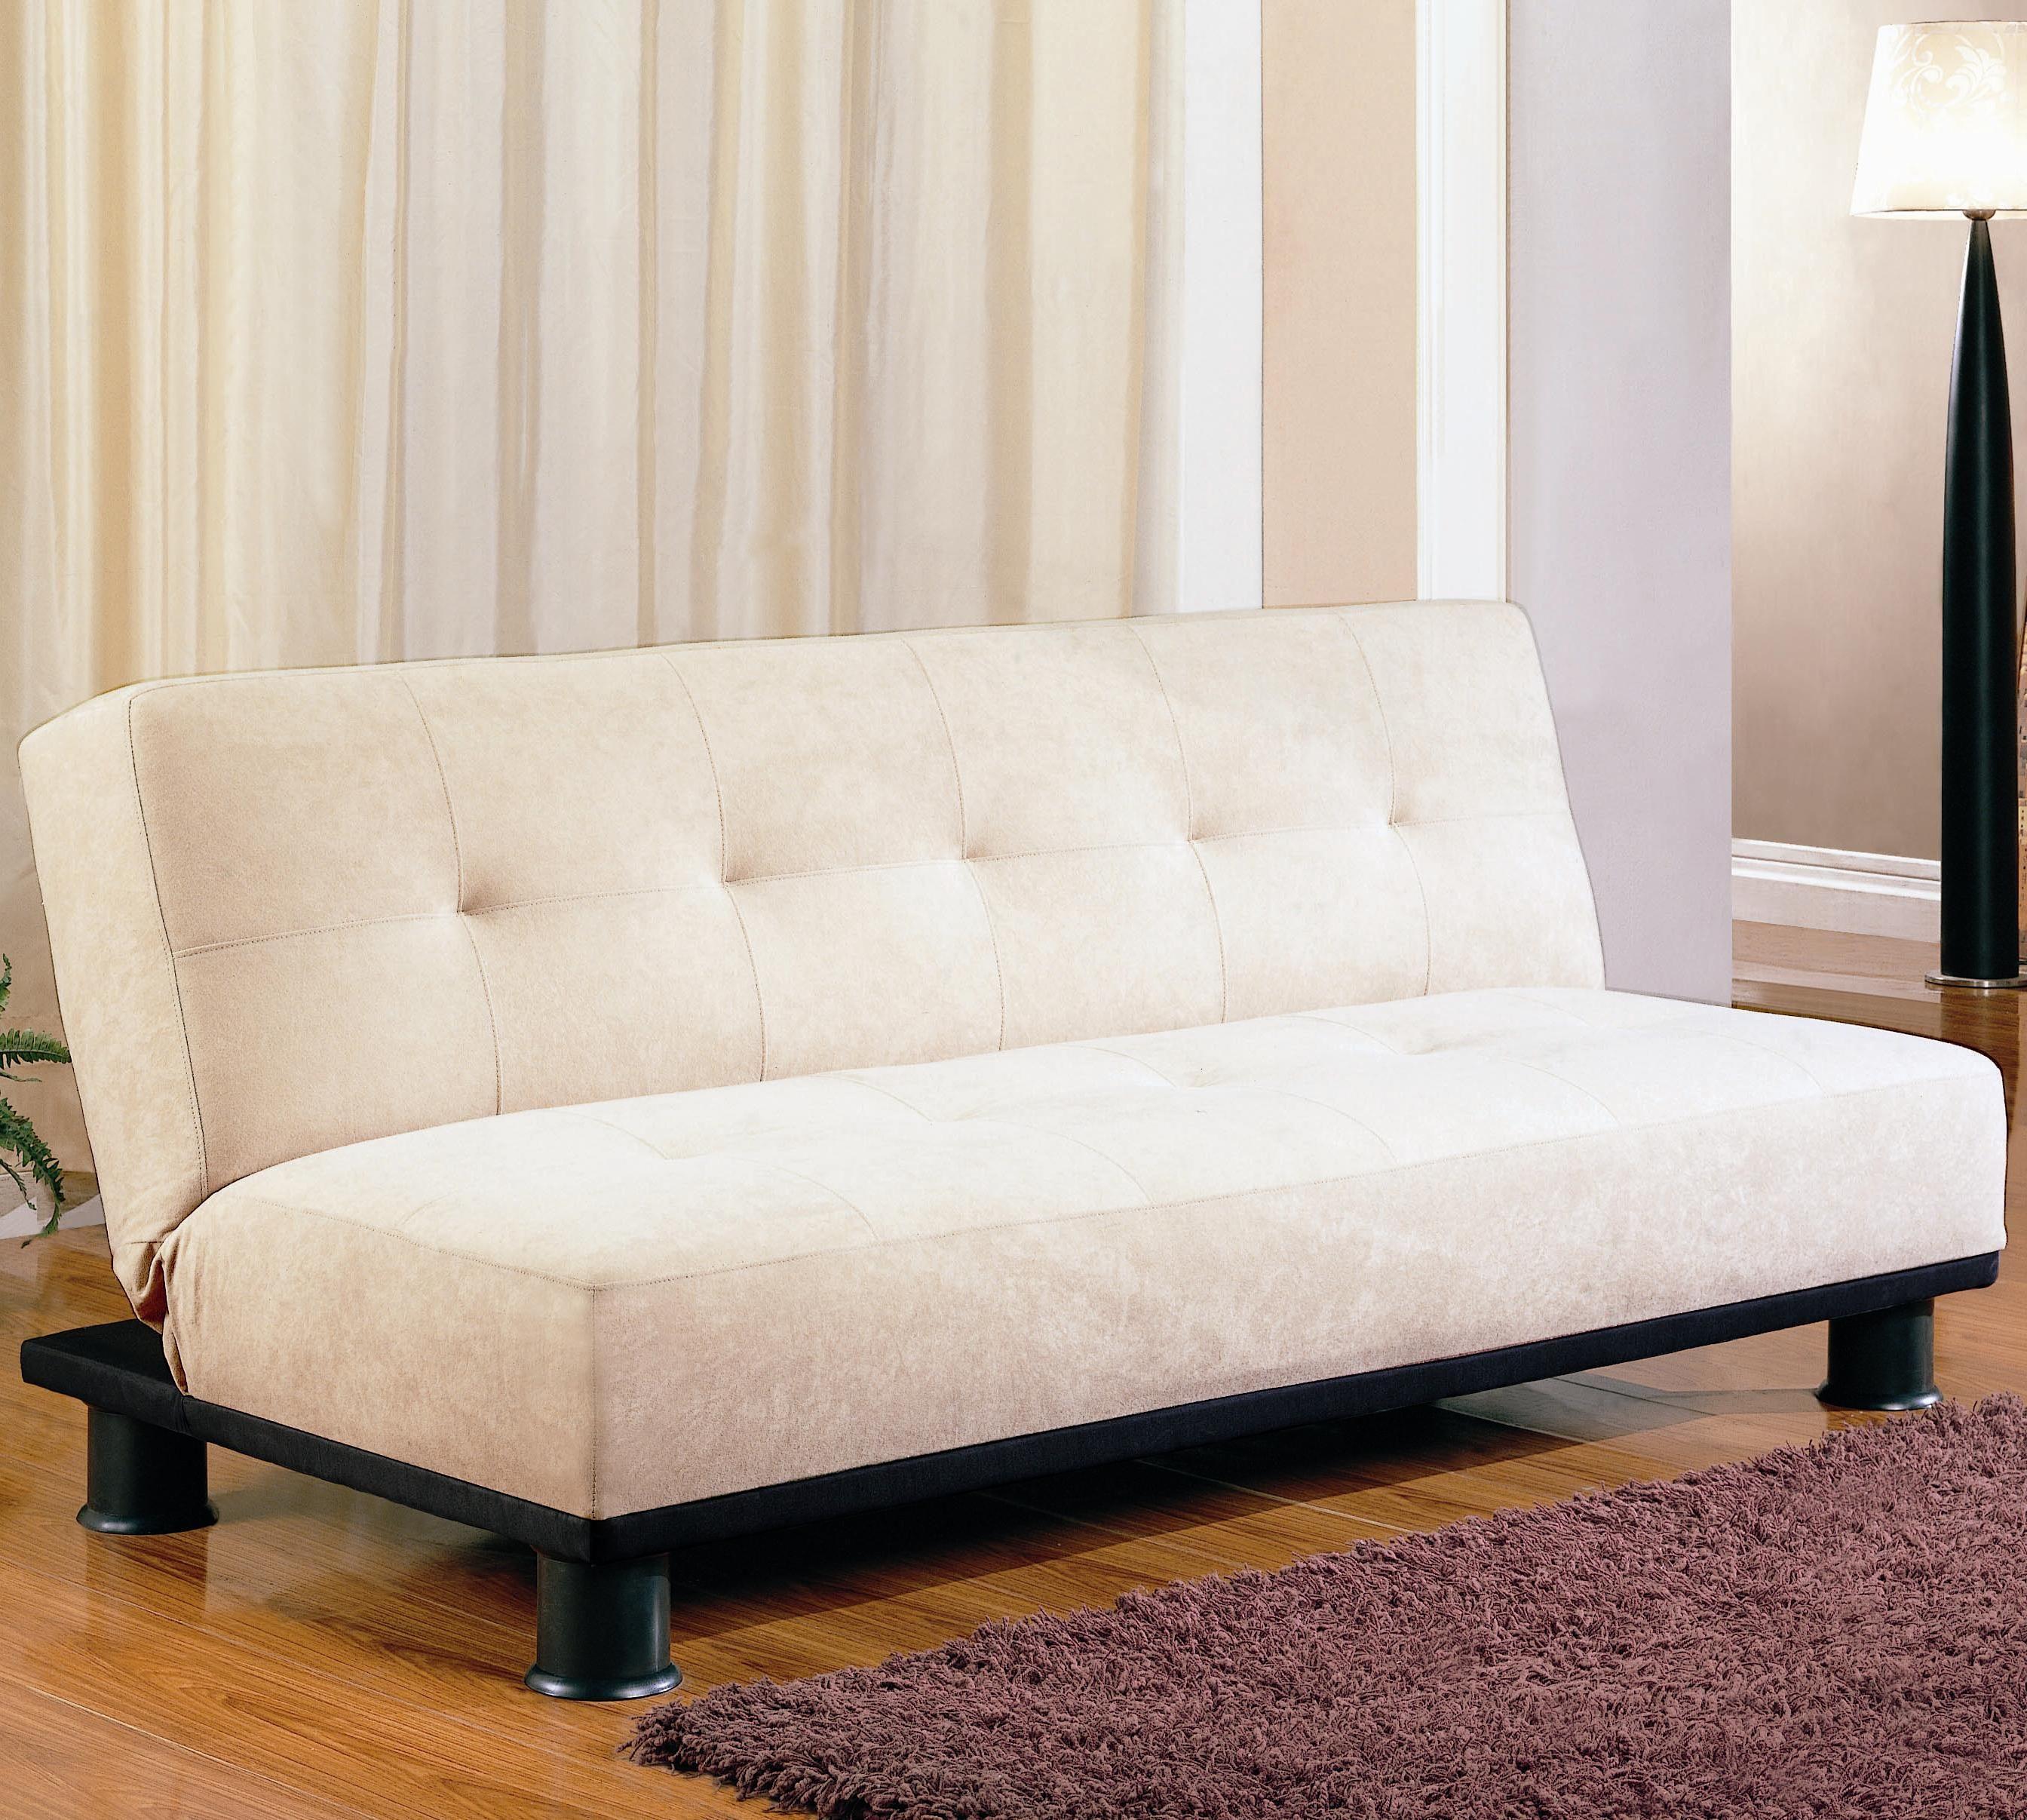 pin by rio netheroez on sofa ideas pinterest sofa sofa bed and rh pinterest com